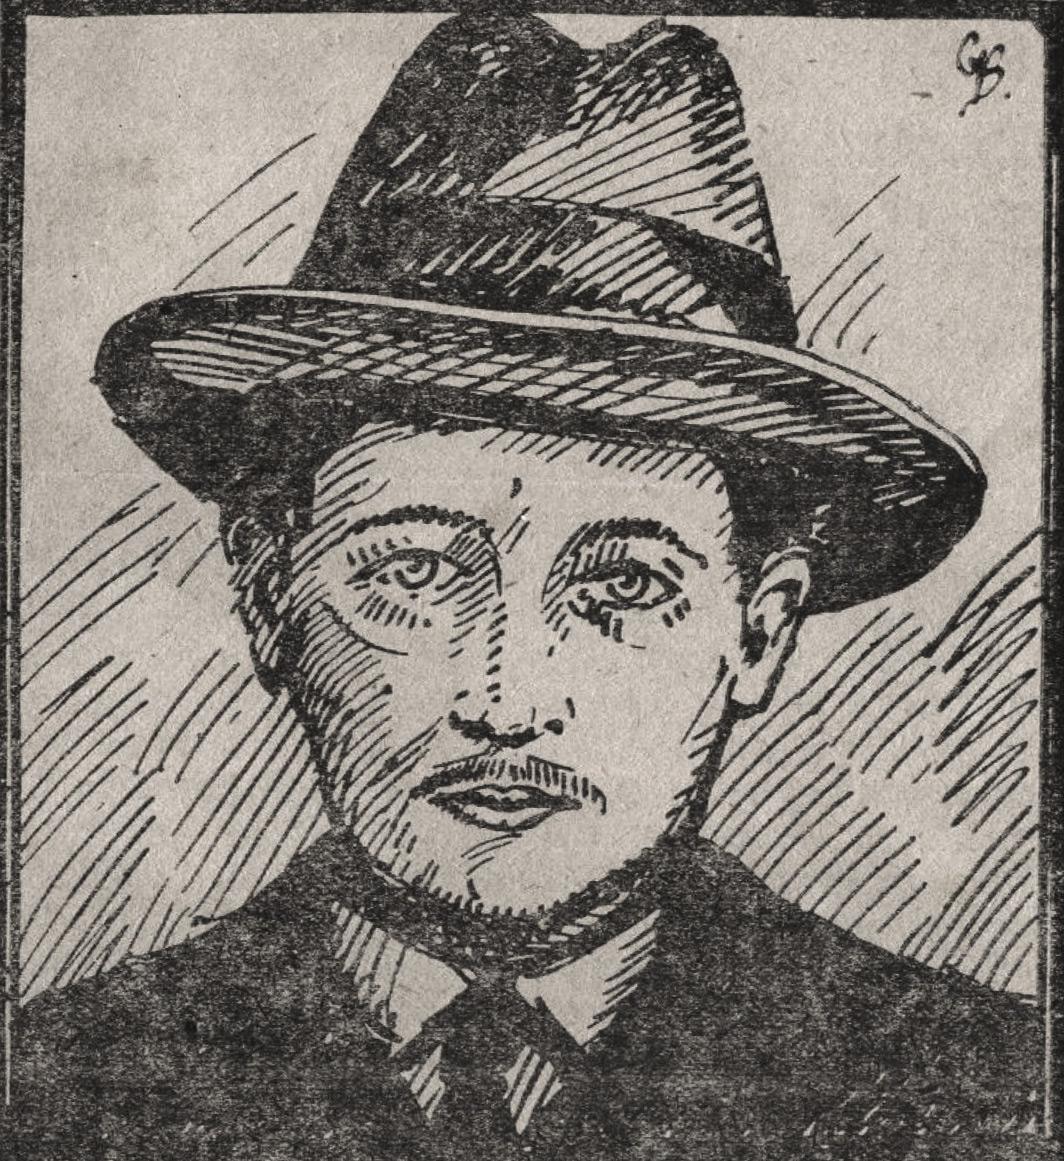 Gaston Rolland, Drawn portrait